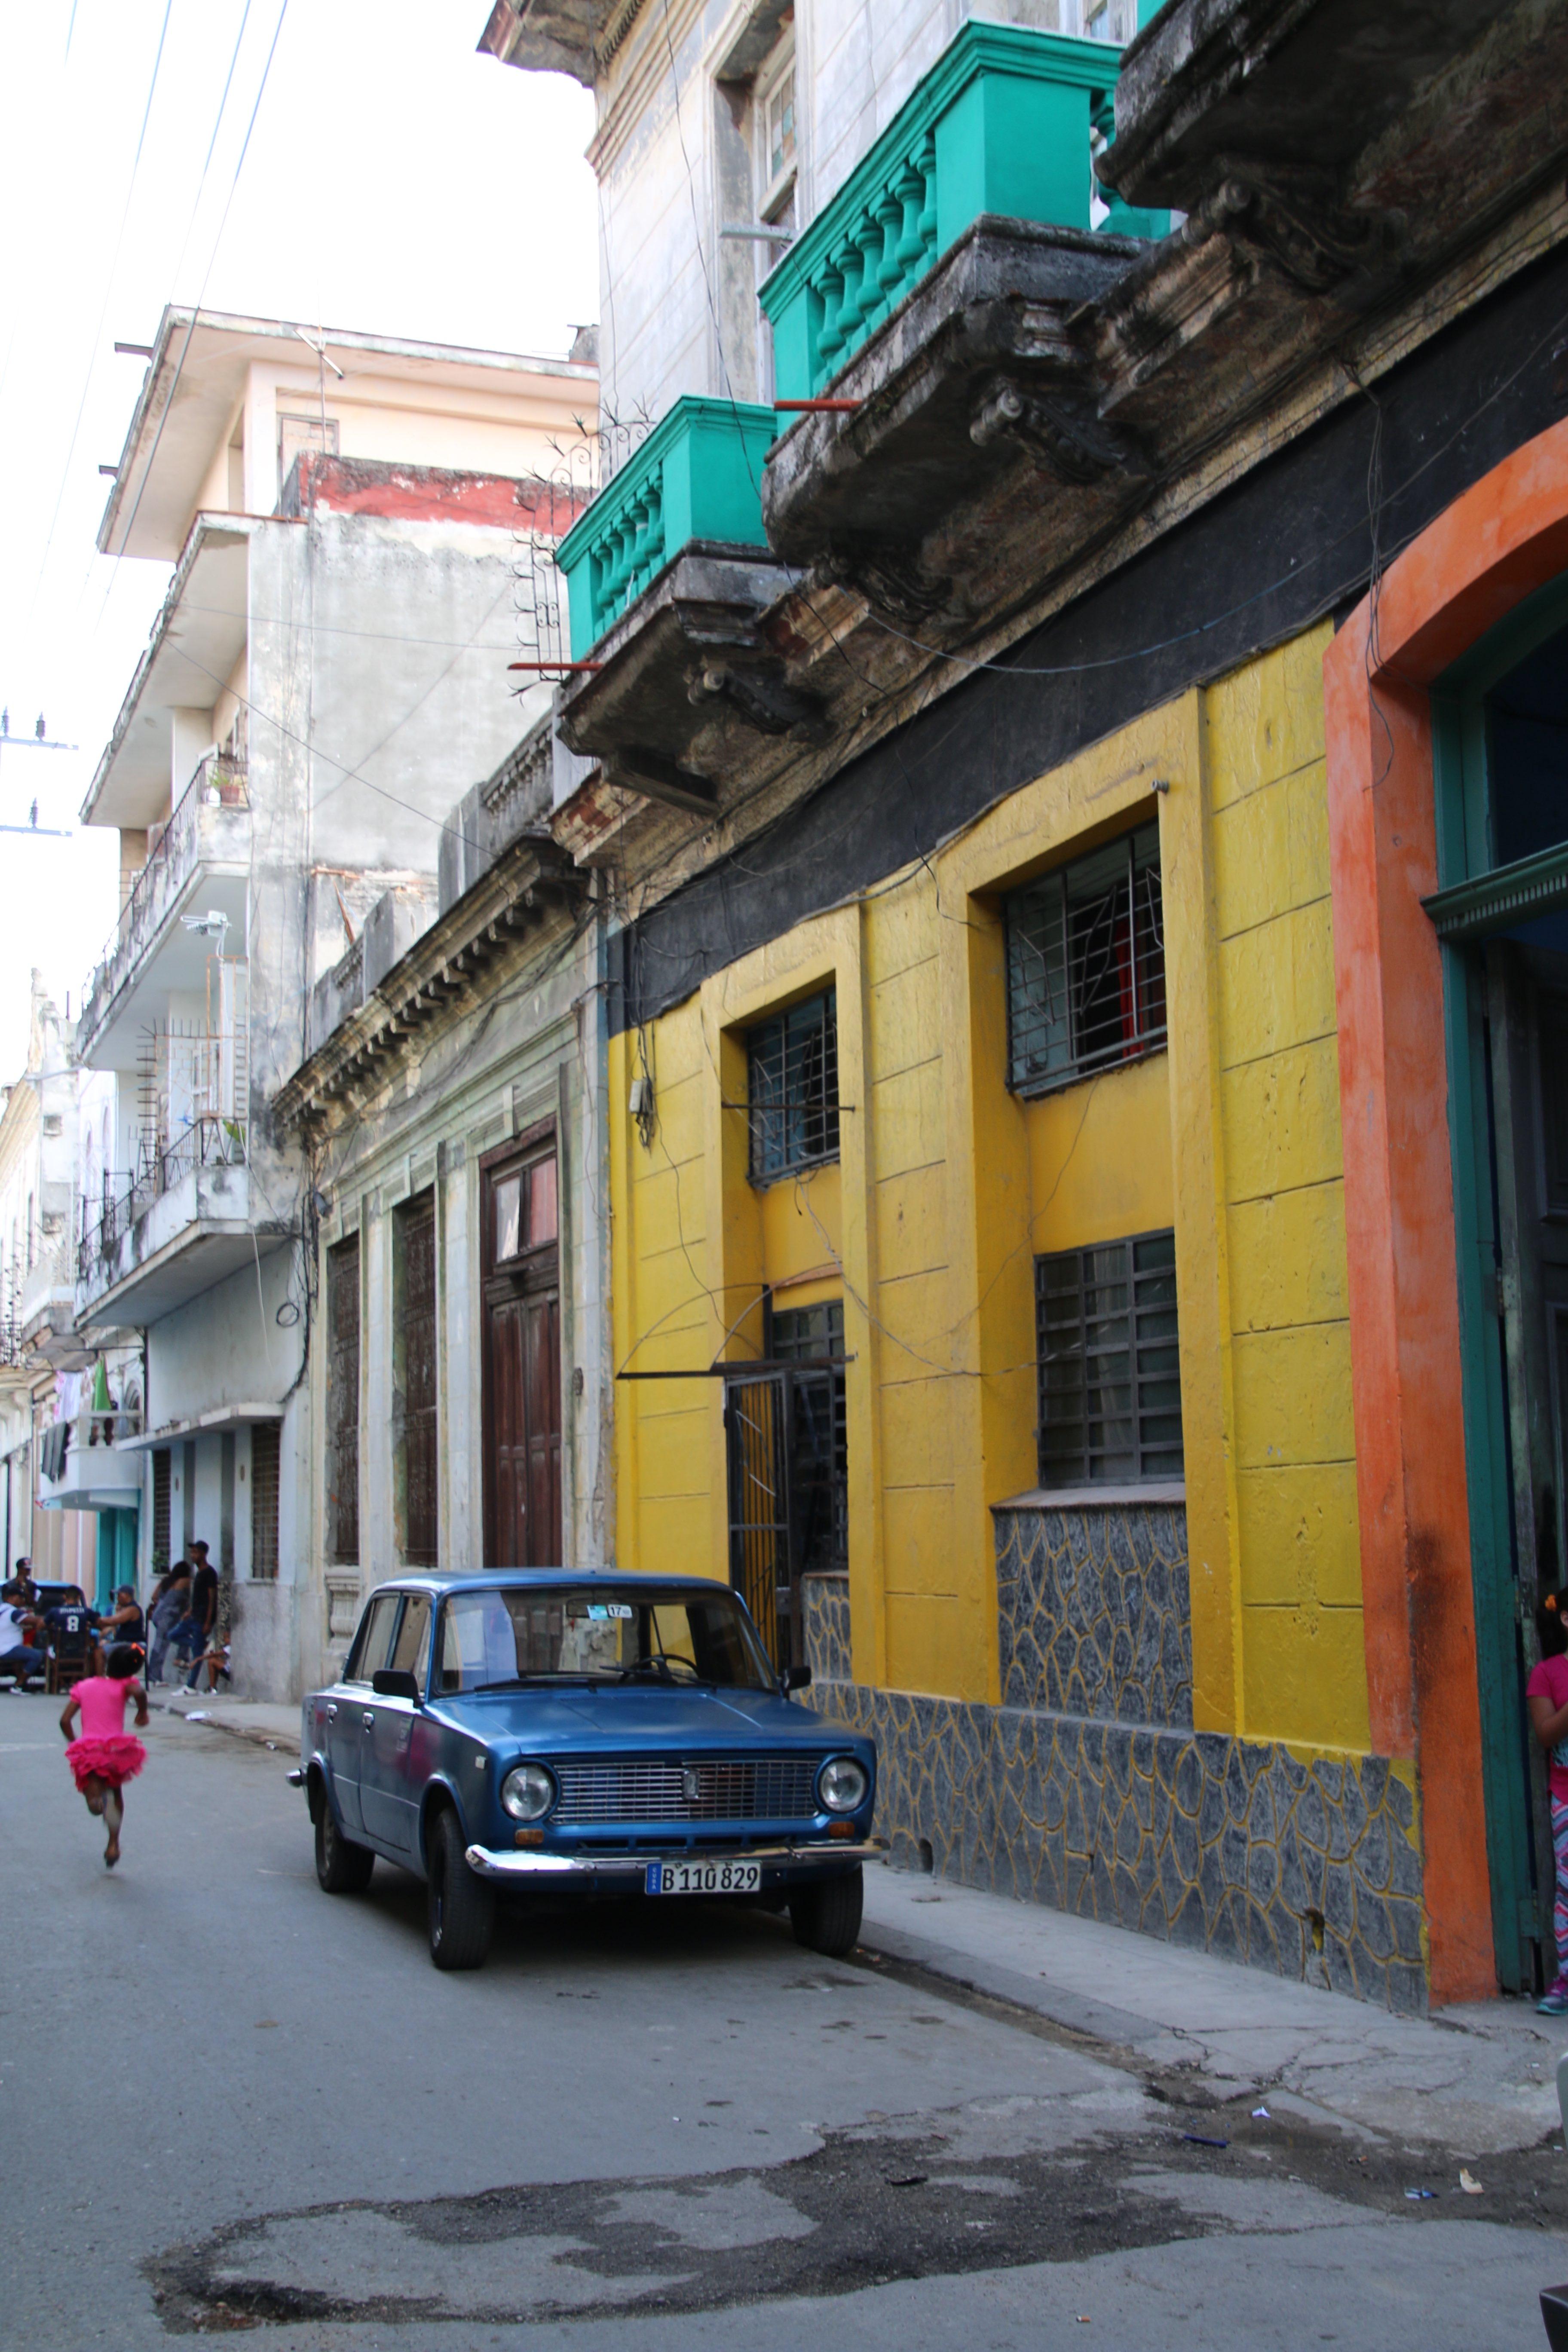 01 - 0426-0429 Habana 46jpeg